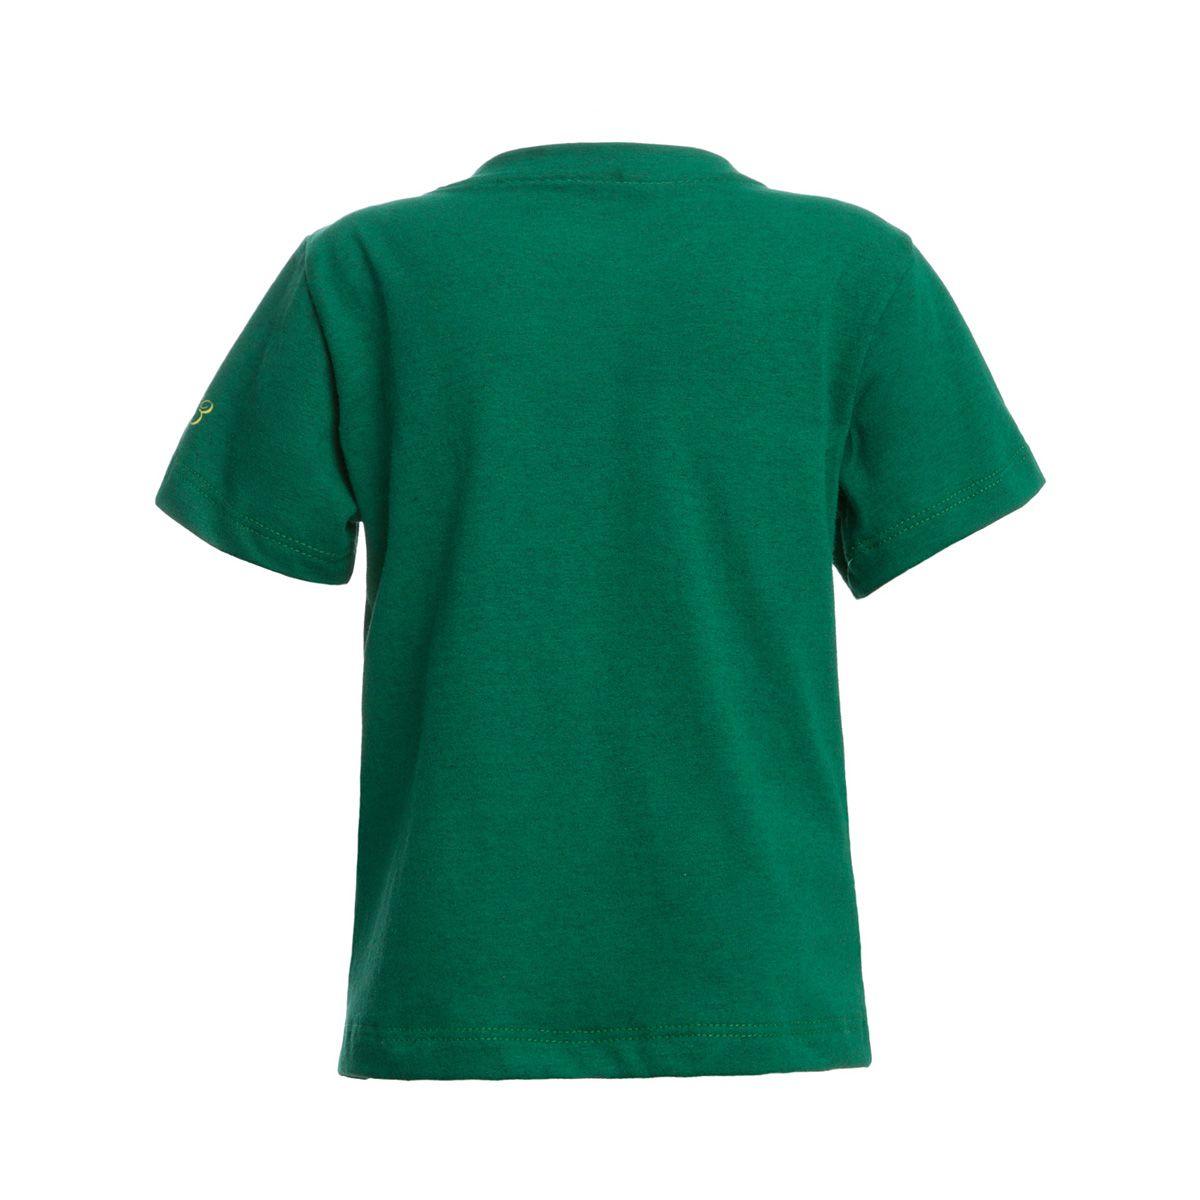 Camisa Infantil Retrô Gol Chapecoense Torcedor 1973 Verde